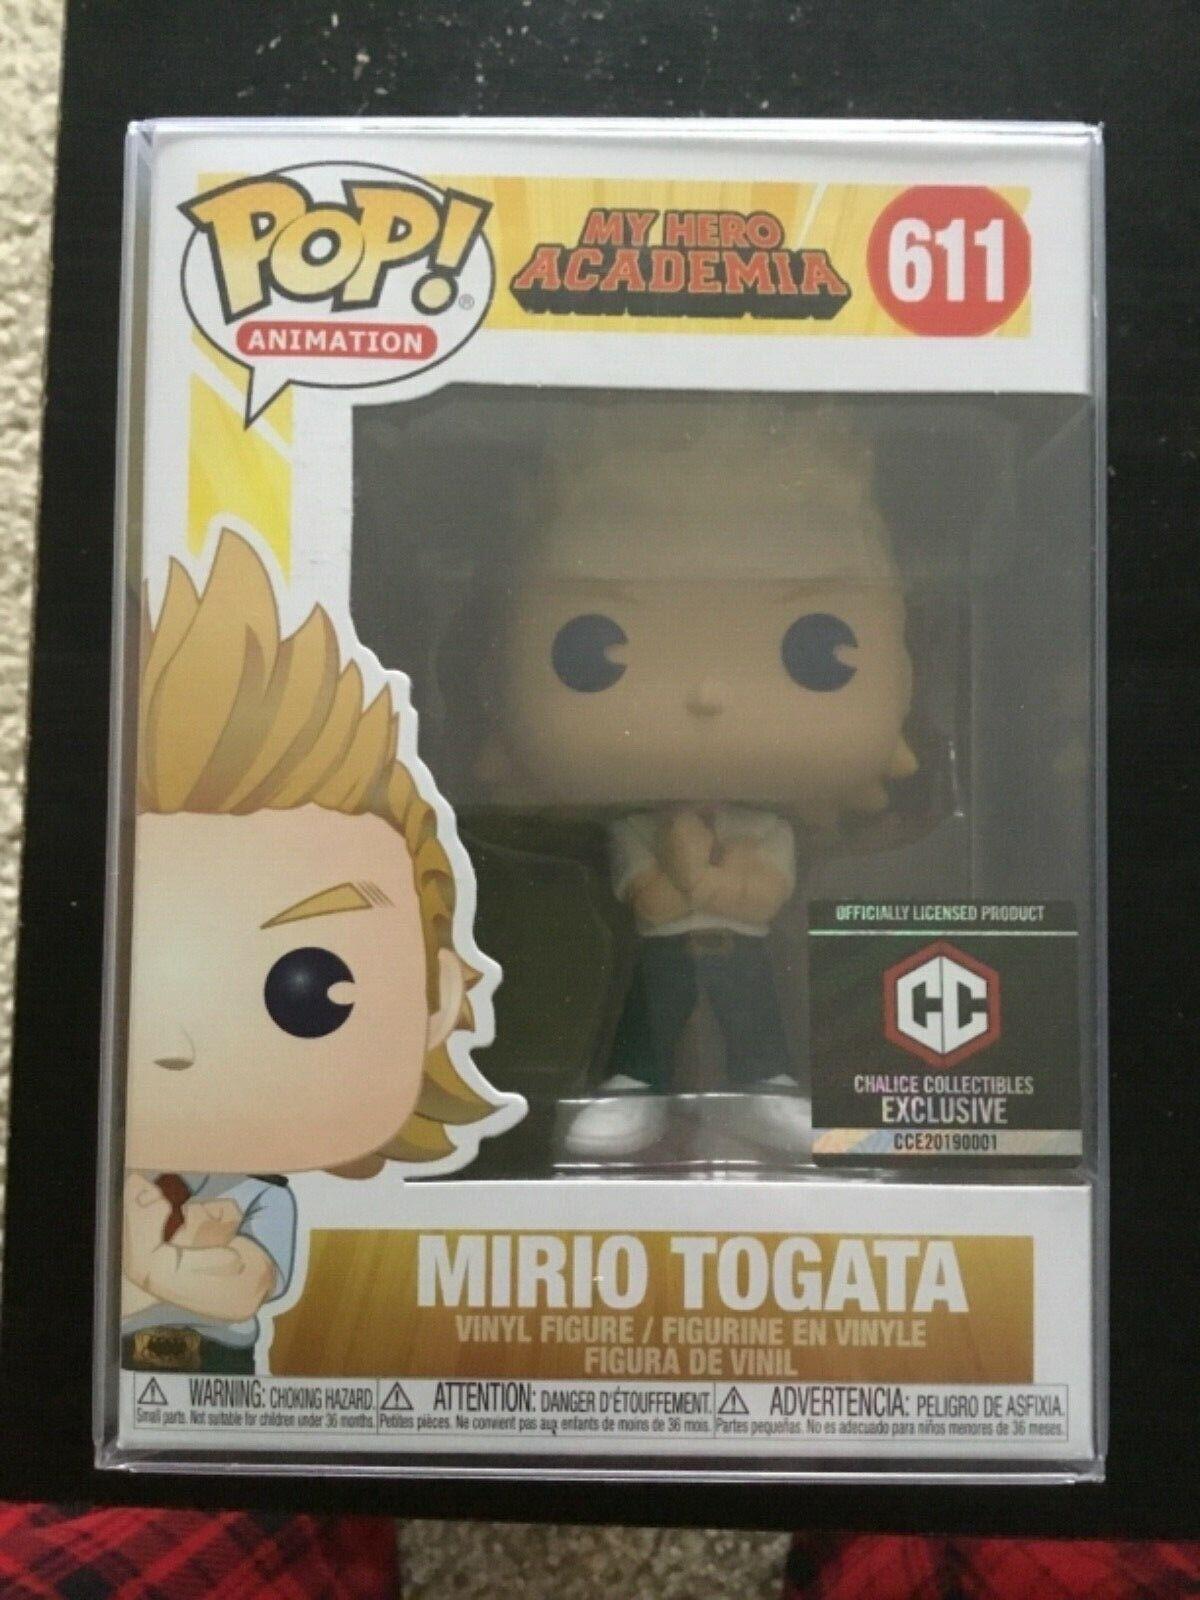 Funko Pop My Hero Academia Mirio Togata Chalice Collectibles Exclusive IN STOCK